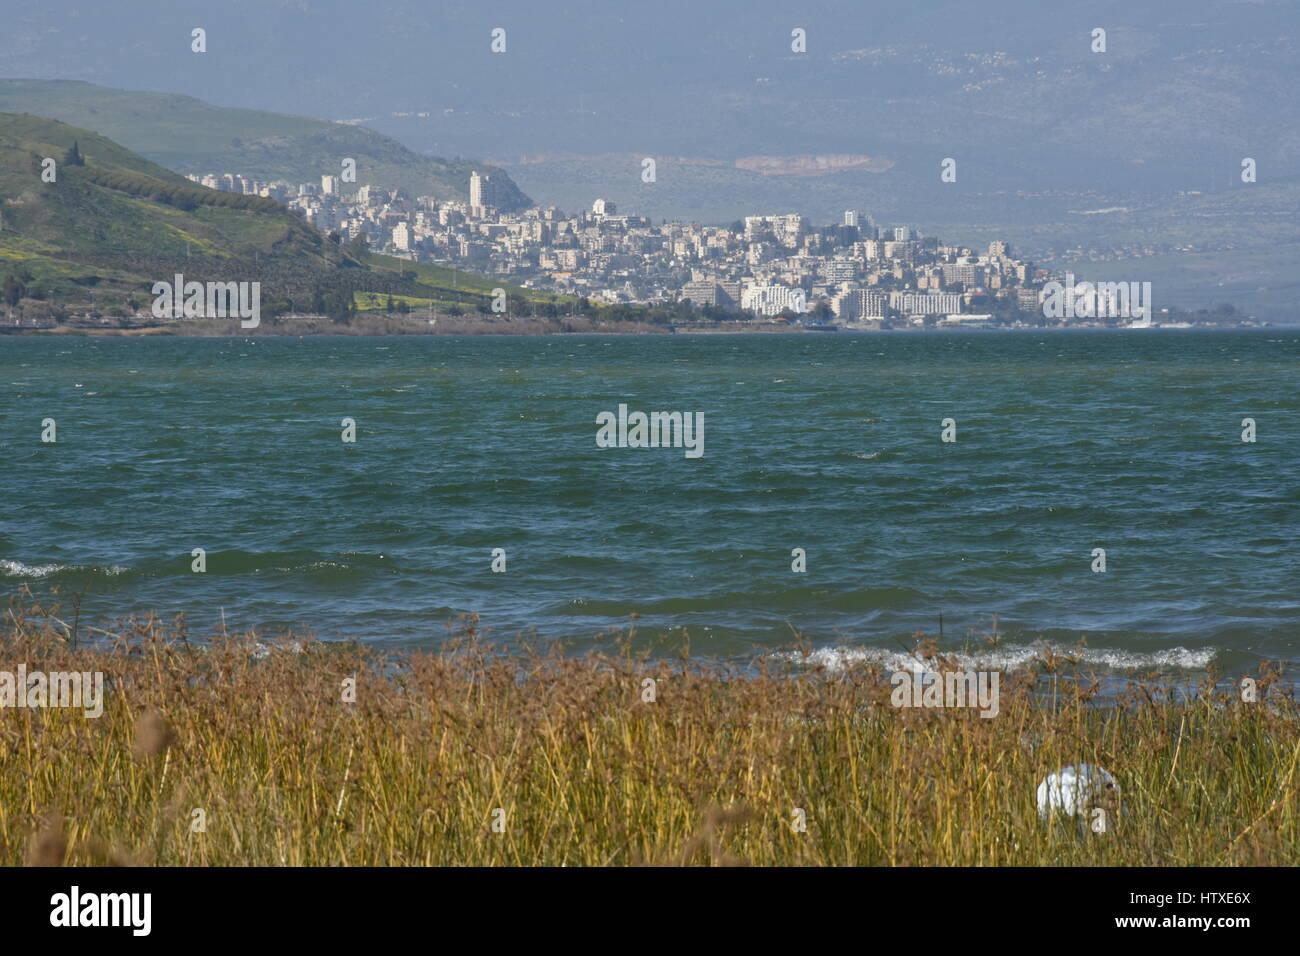 The sea of Galilee and Tiberias - Stock Image